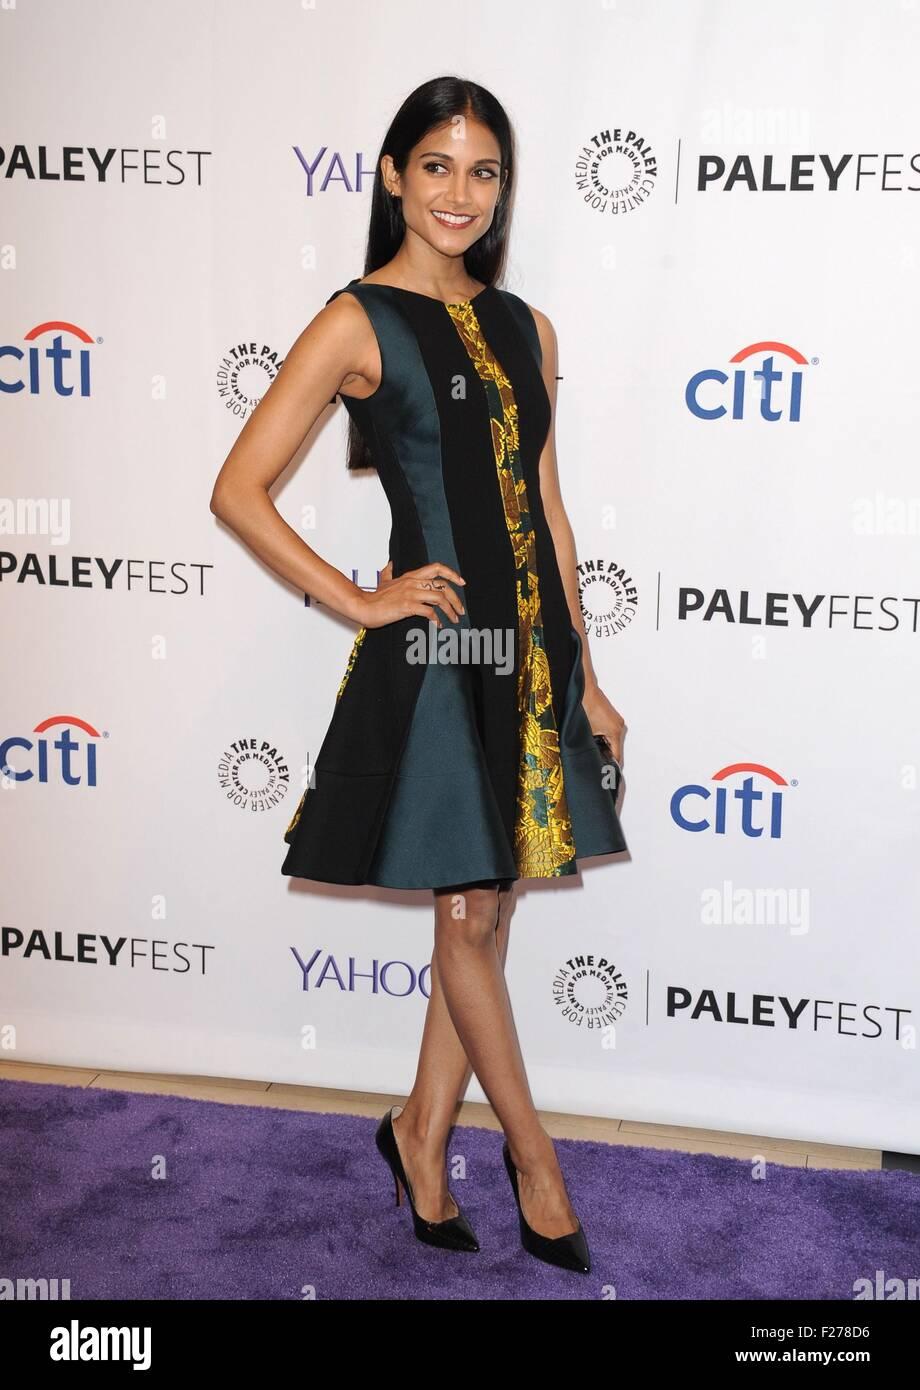 Genevieve Gaunt,Candy Palmater Erotic pics Midori (actress),Sharni Vinson